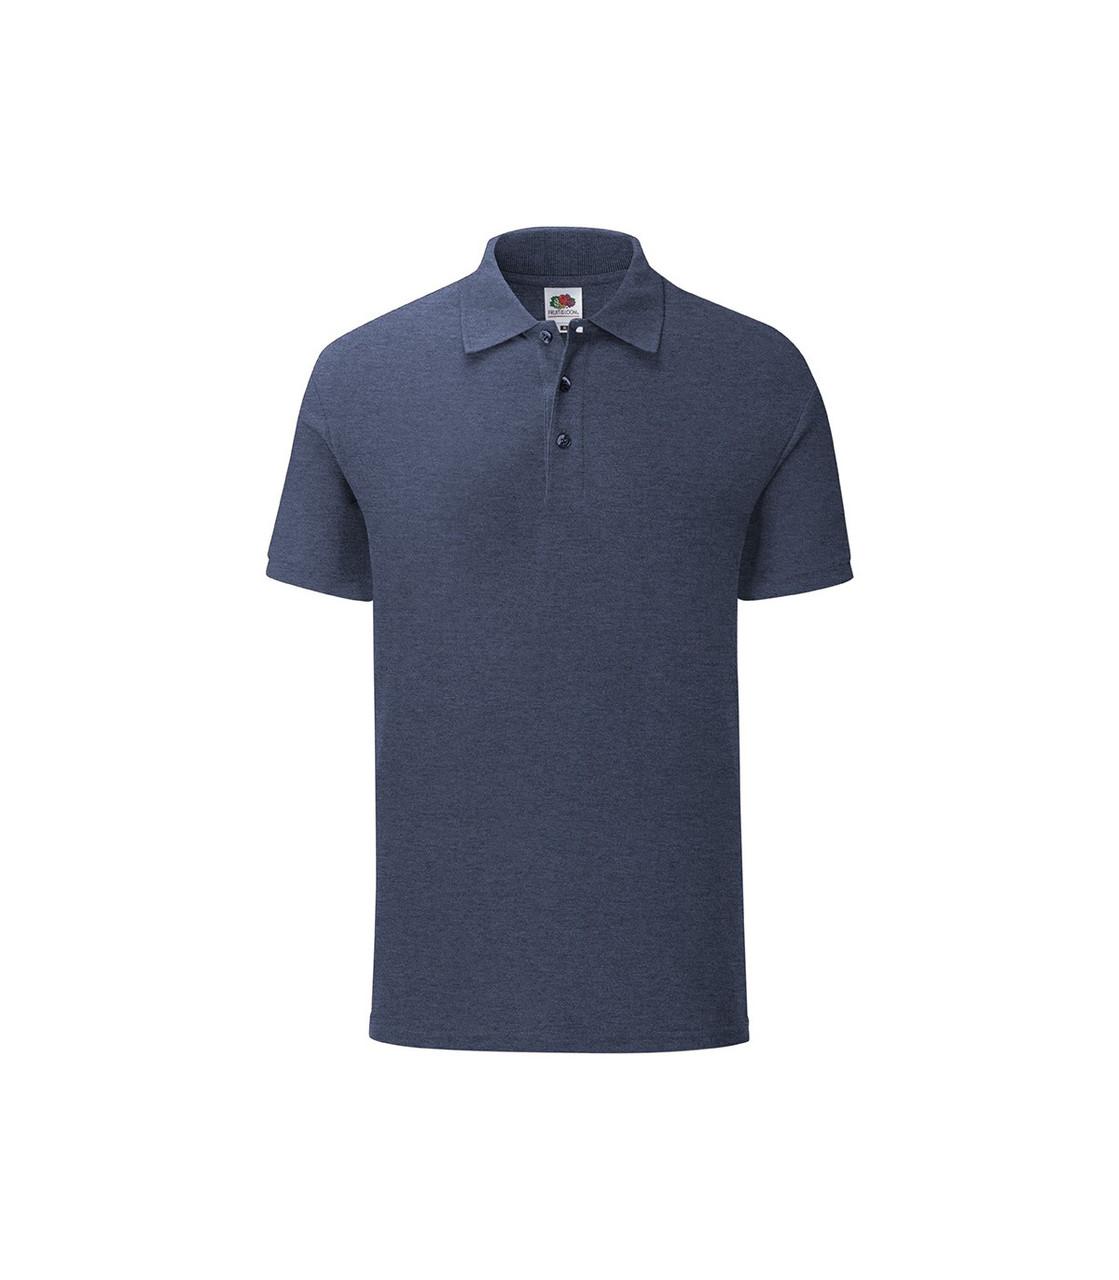 Мужская футболка поло хлопок темно-синяя меланж 044-VF